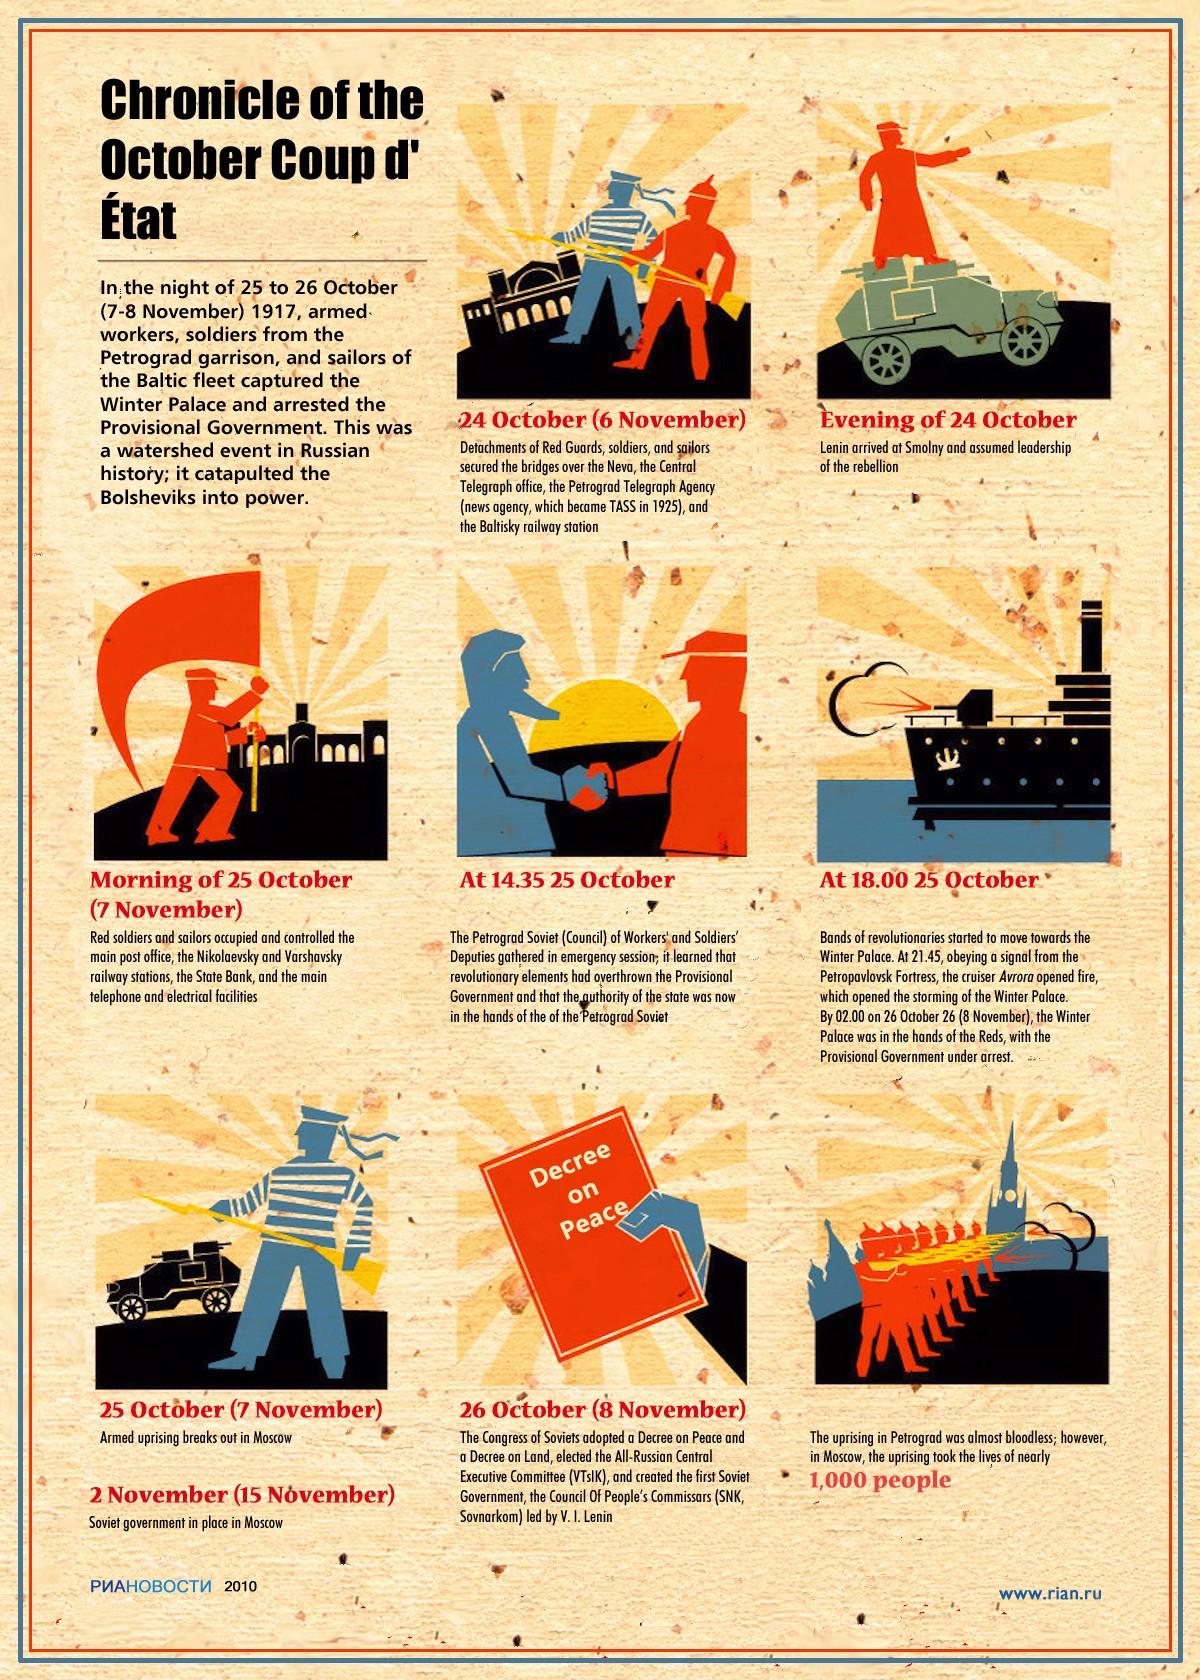 00 RIA-Novosti Infographics. Chronicle of the October Coup d' État. 2011